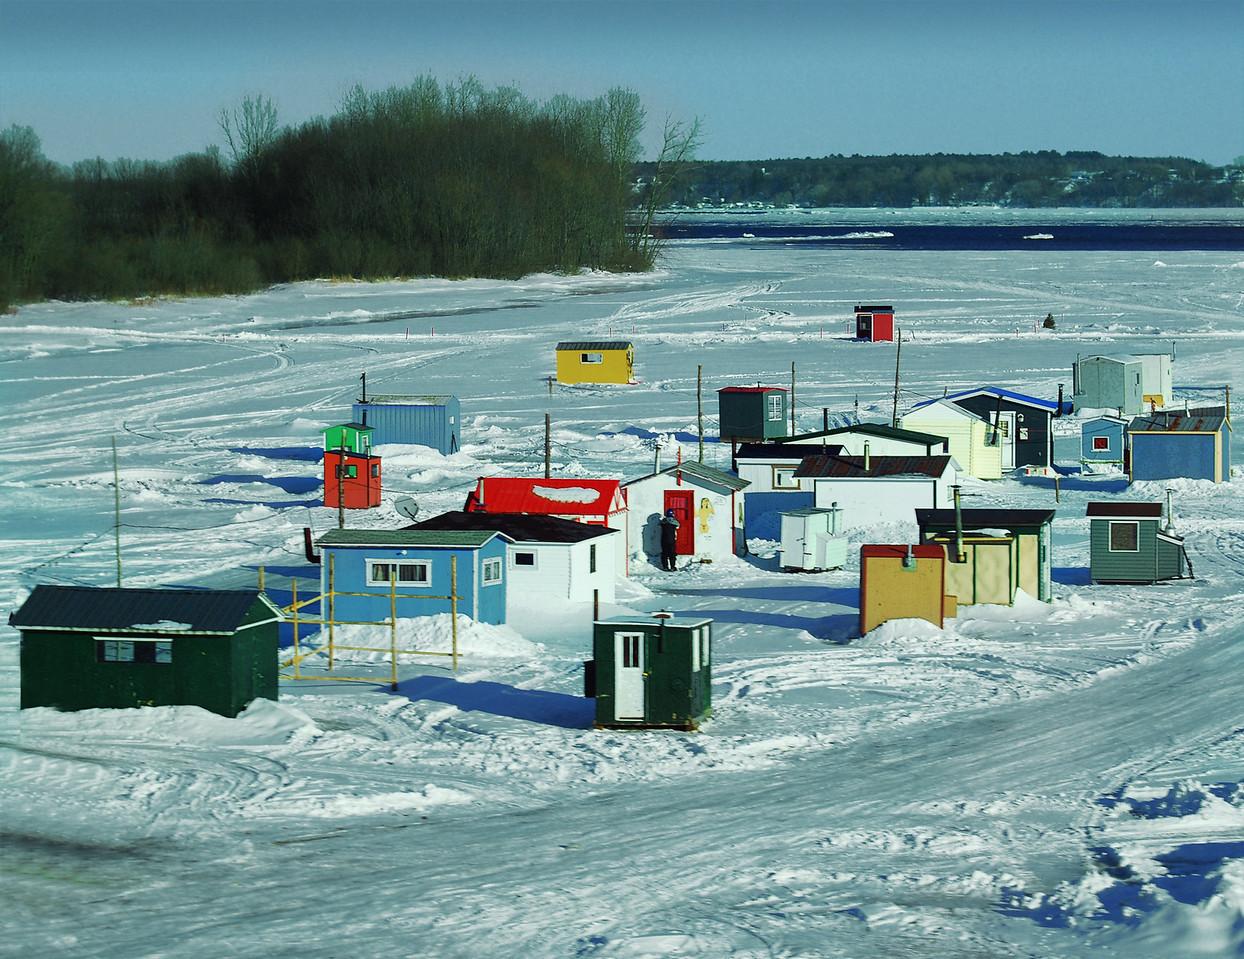 Quebec Ice Fishing Village